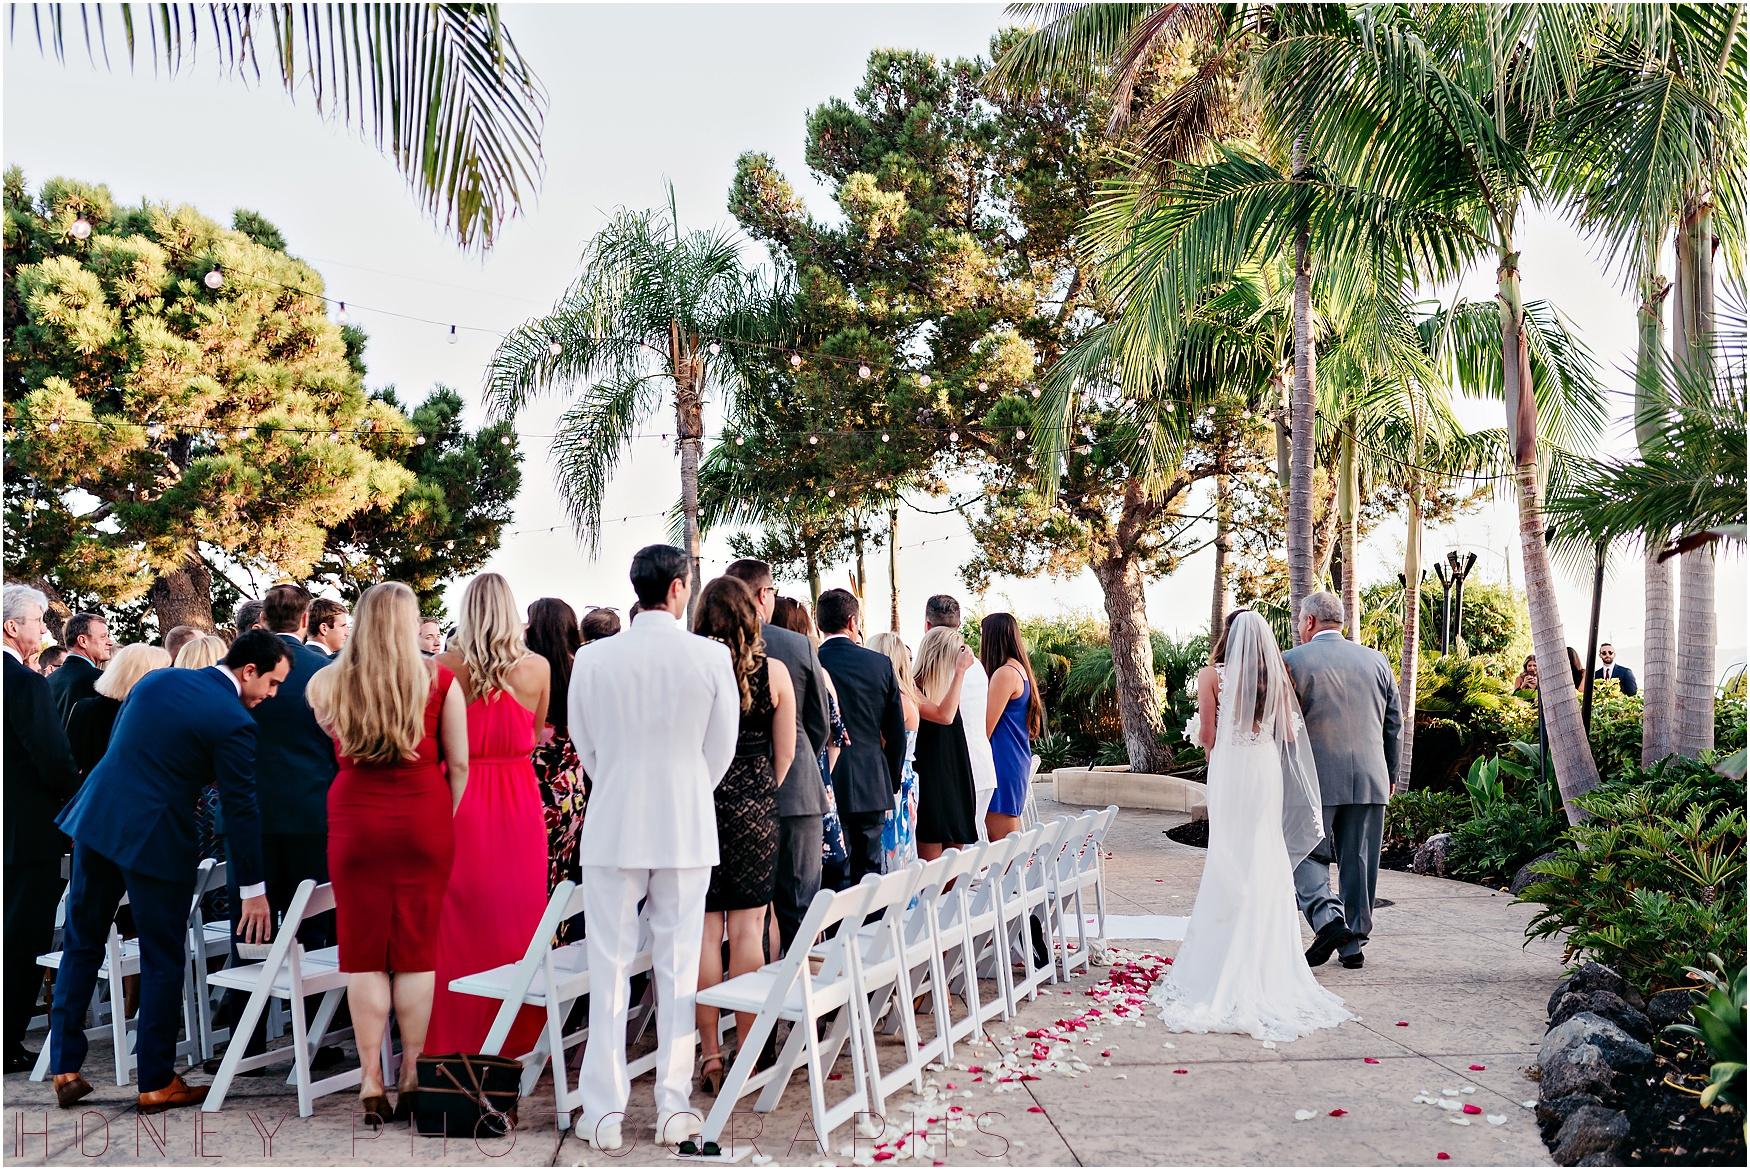 bali-hai-tropical-bubble-exit-party-paradise-wedding020.jpg